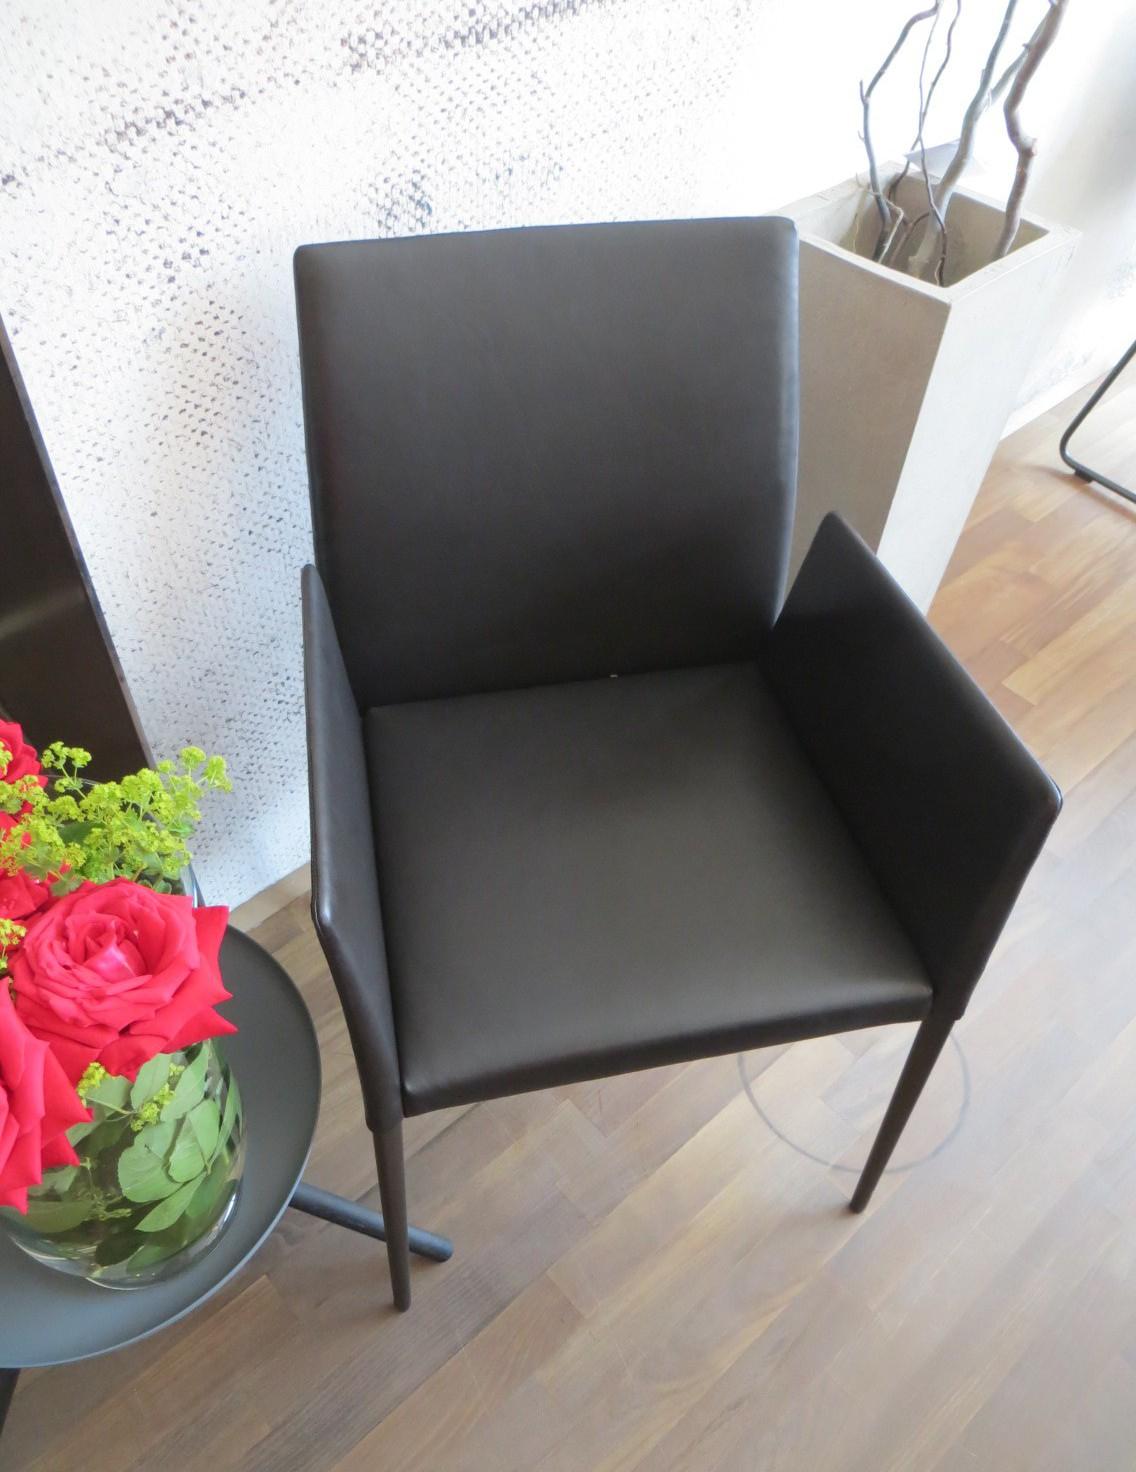 deen 1606 stuhl mit armlehnen. Black Bedroom Furniture Sets. Home Design Ideas